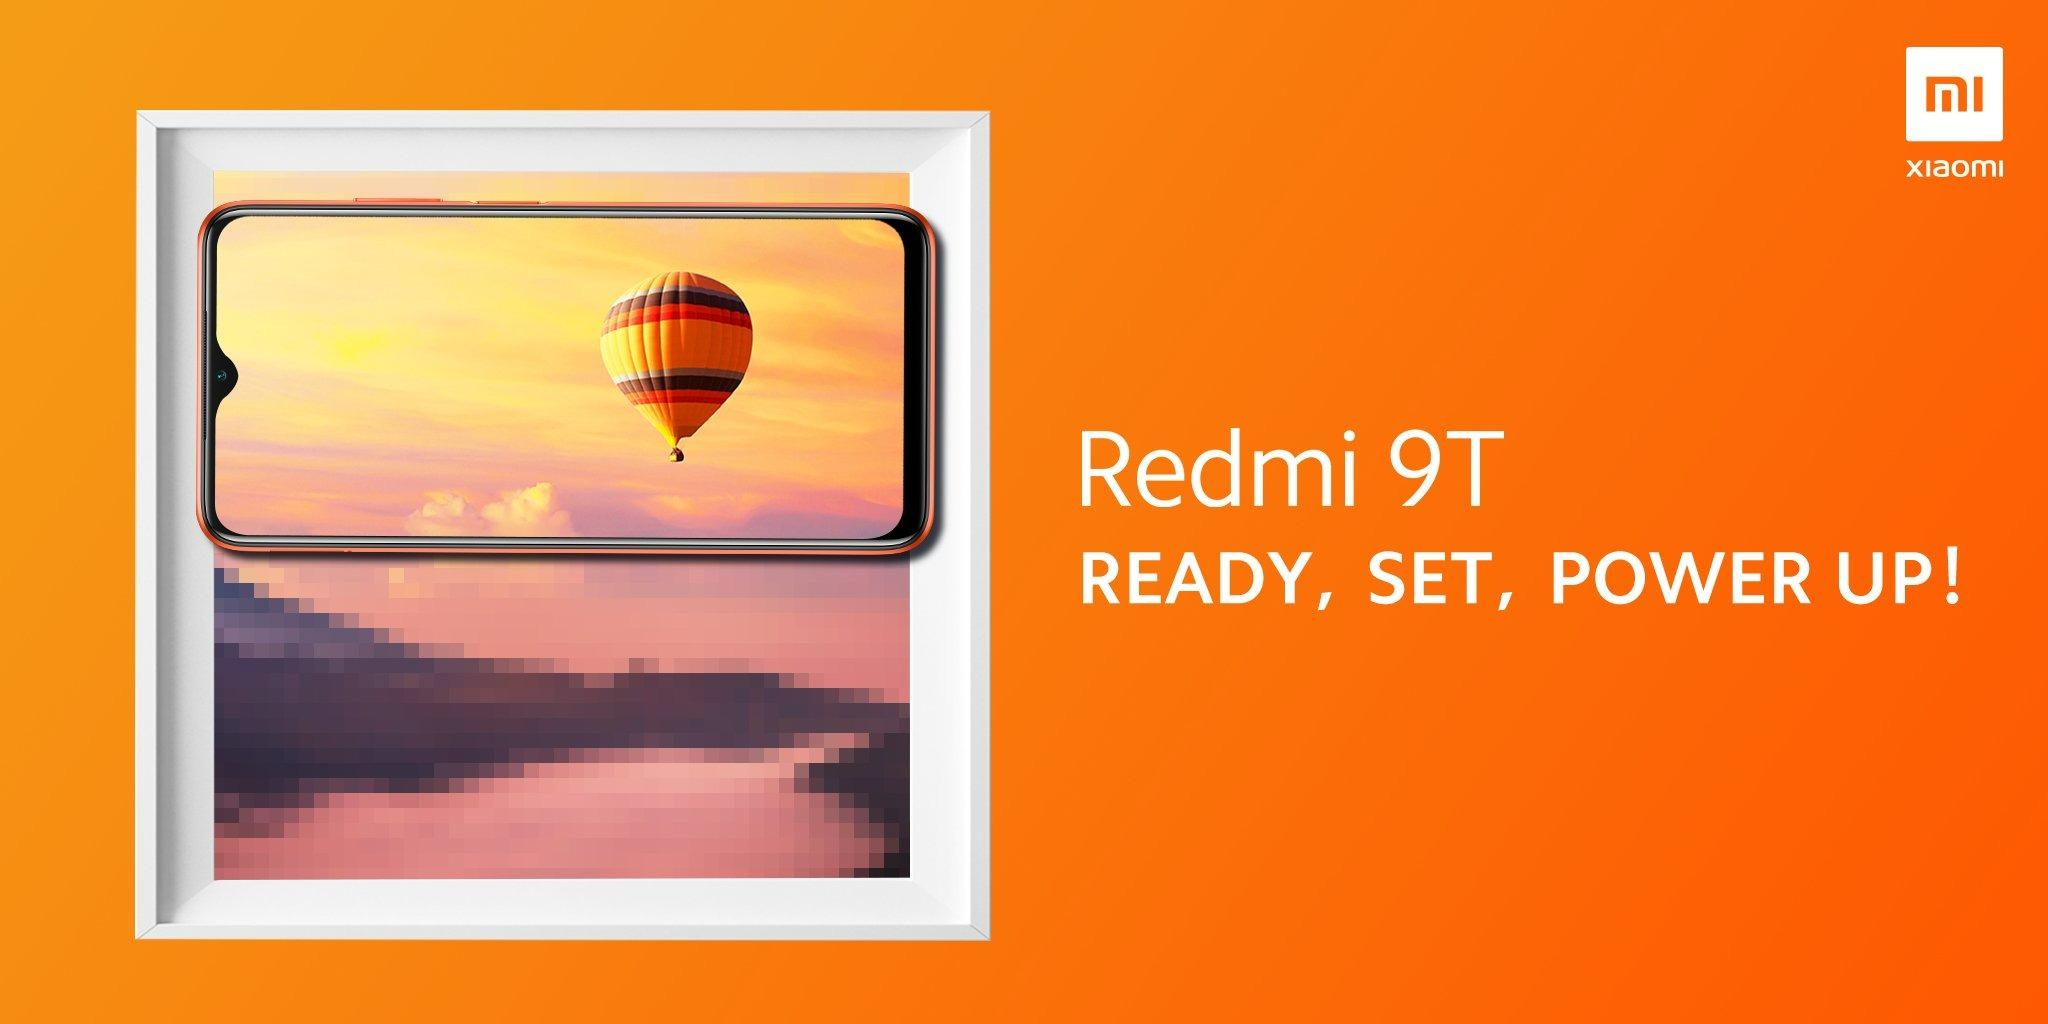 Teasing du Xiaomi Redmi 9T